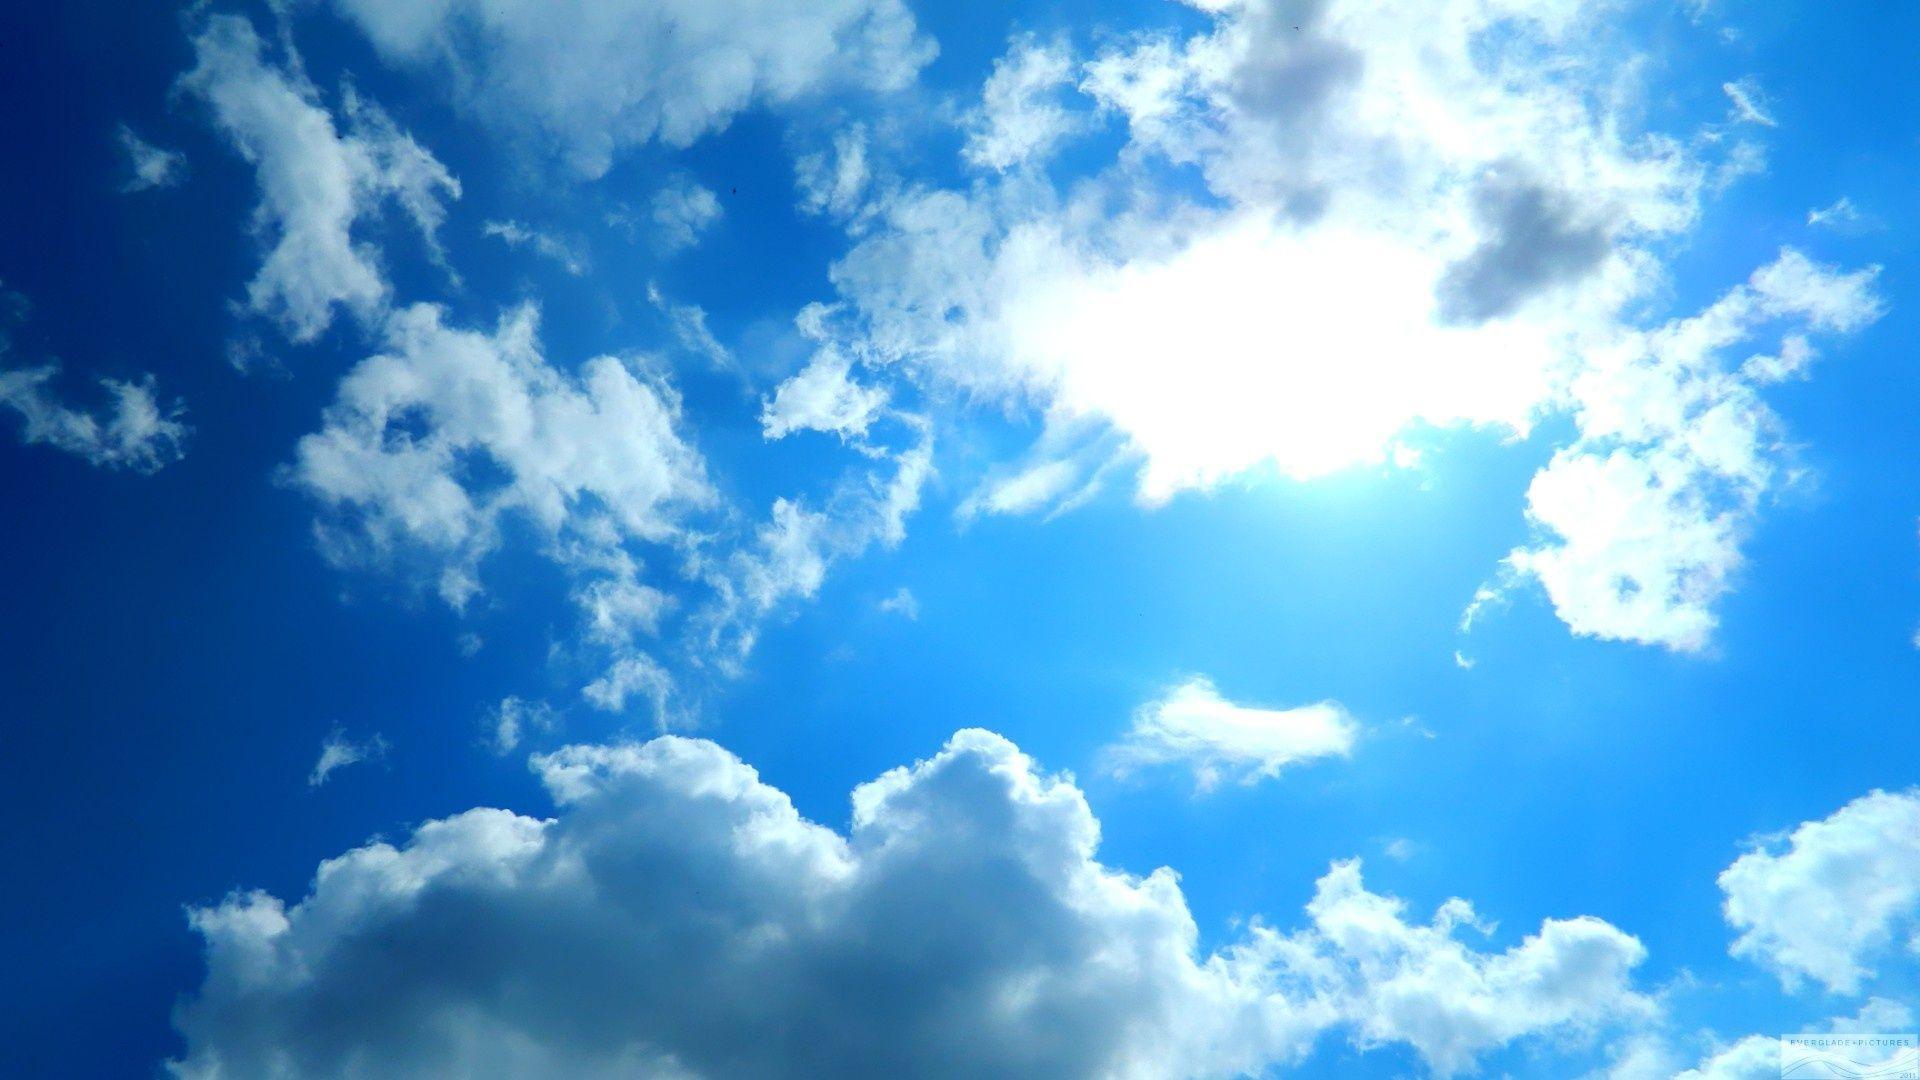 Blue Sky Desktop Wallpapers Top Free Blue Sky Desktop Backgrounds Wallpaperaccess